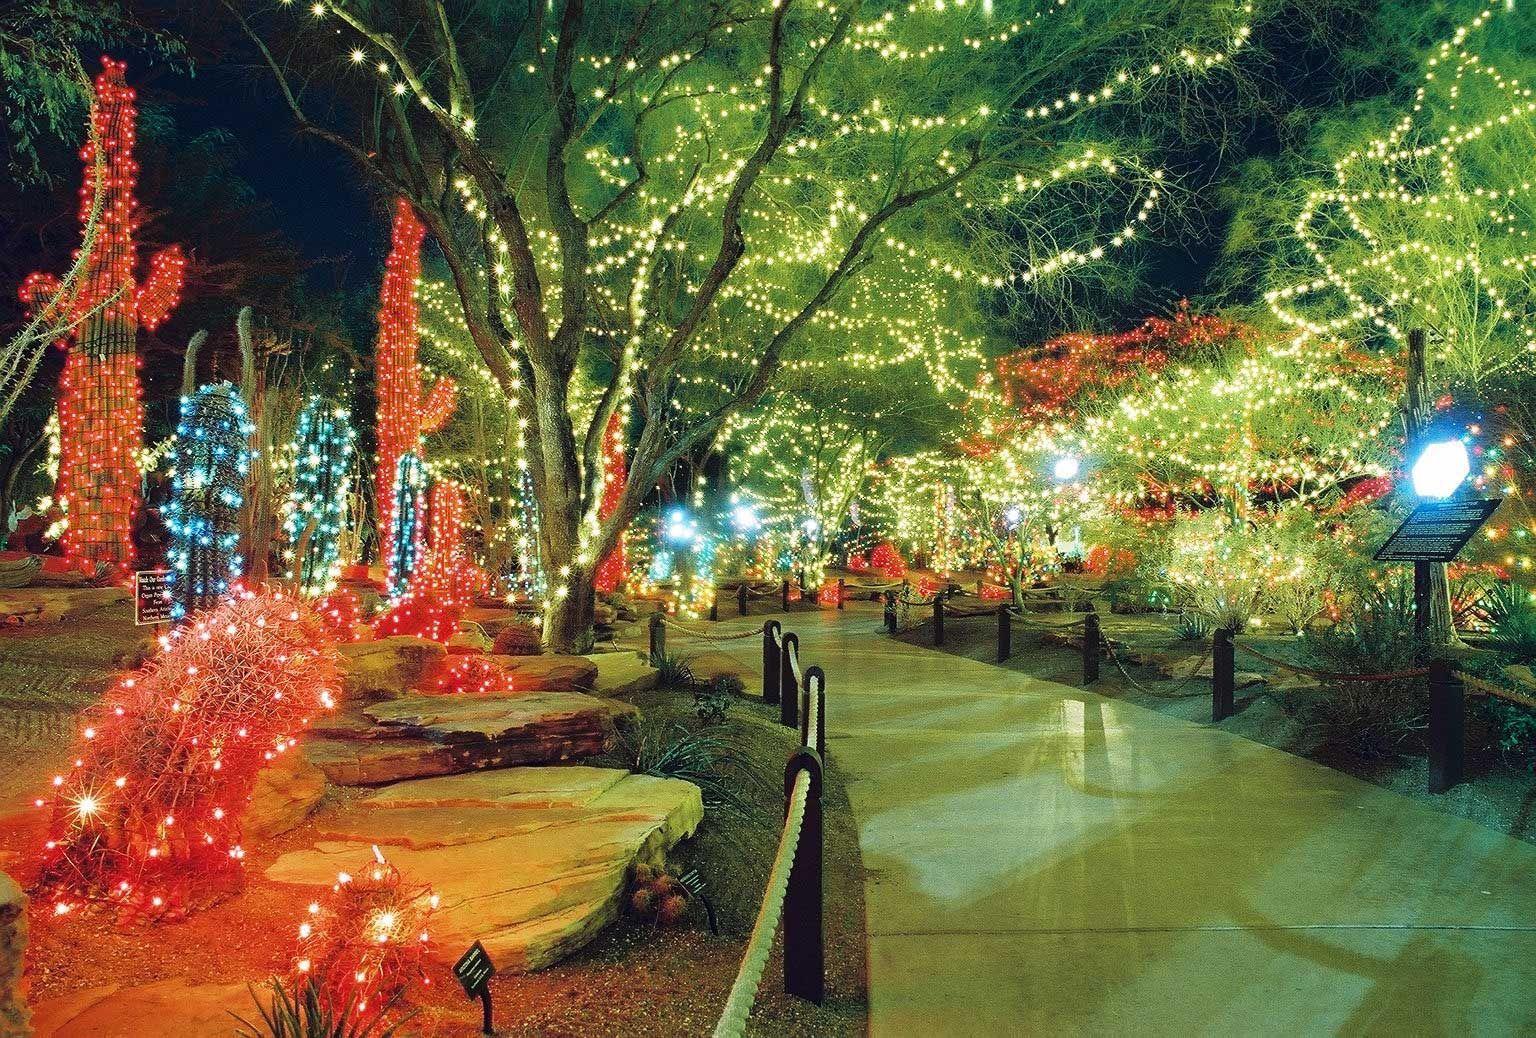 Las Vegas Cactus Garden Christmas Lights